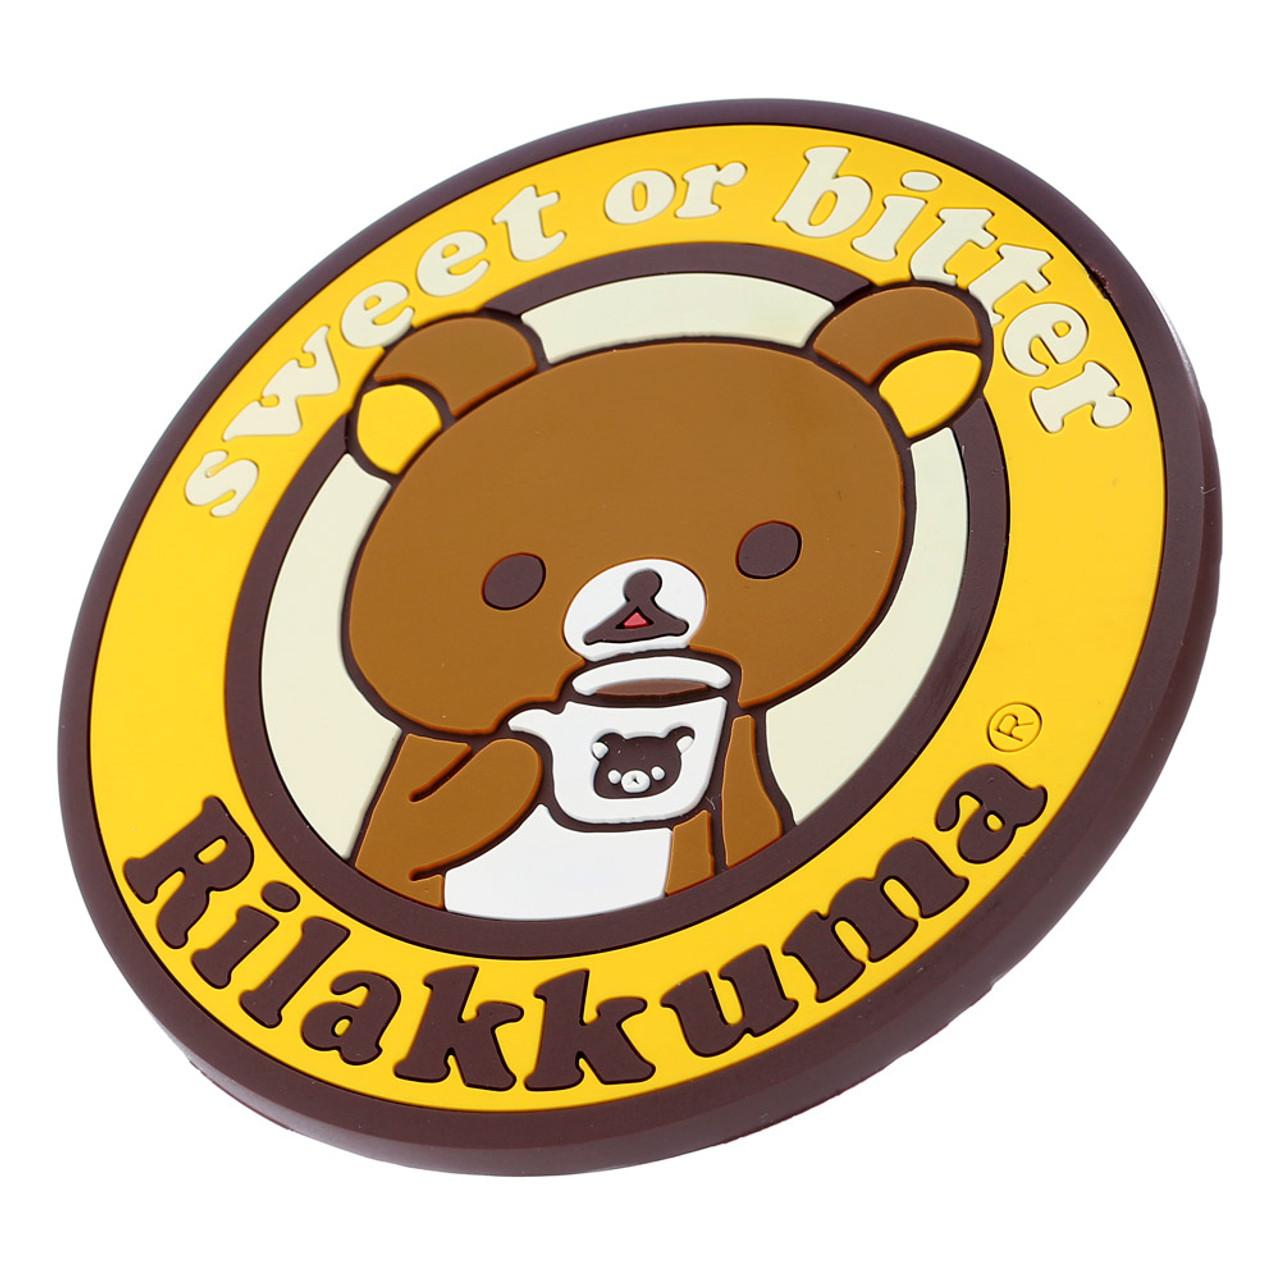 San-x Rilakkuma Circle Chocolate Coffee Mug Coaster - KY00901 ( Side )